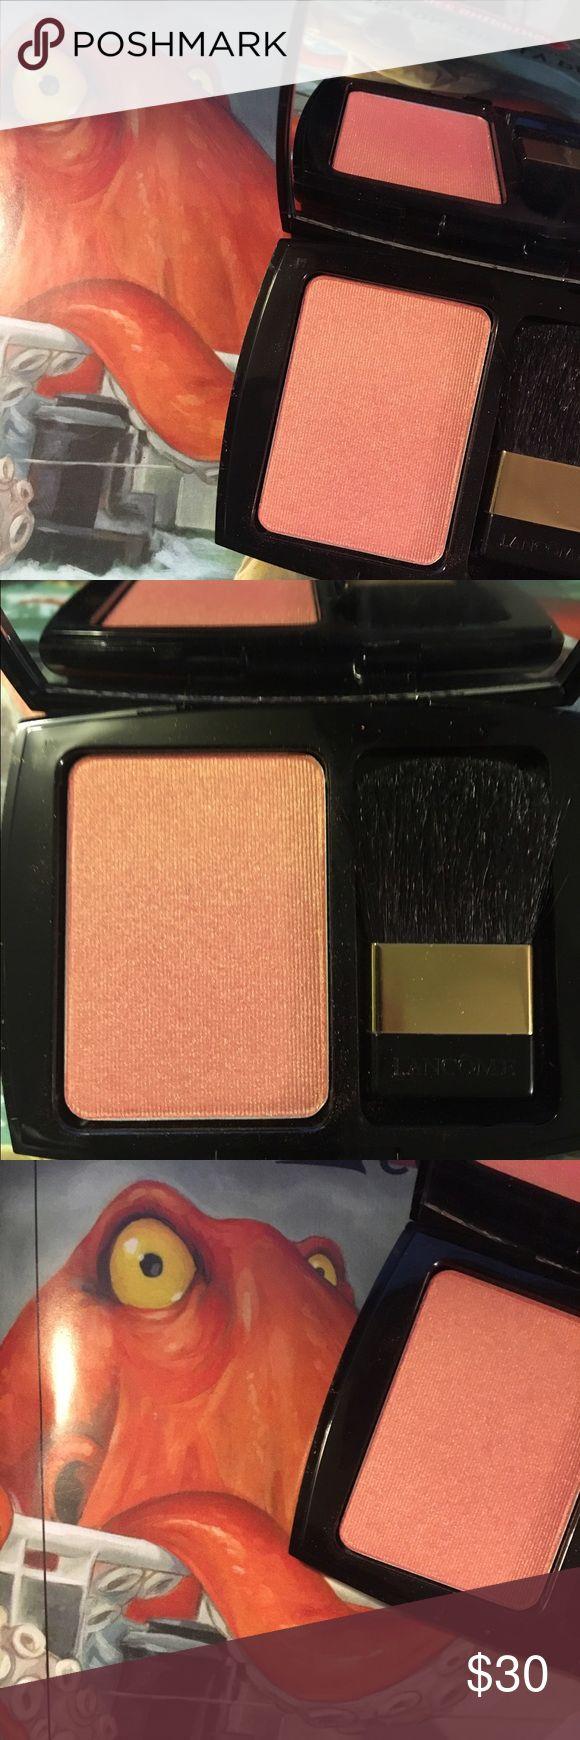 💕On Hold💕Lancôme Blush ~ Summer Mandarin Sky New, never used Lancôme Blush Subtil shimmer. Perfect spring and summer shade. Full size. Lancome Makeup Blush